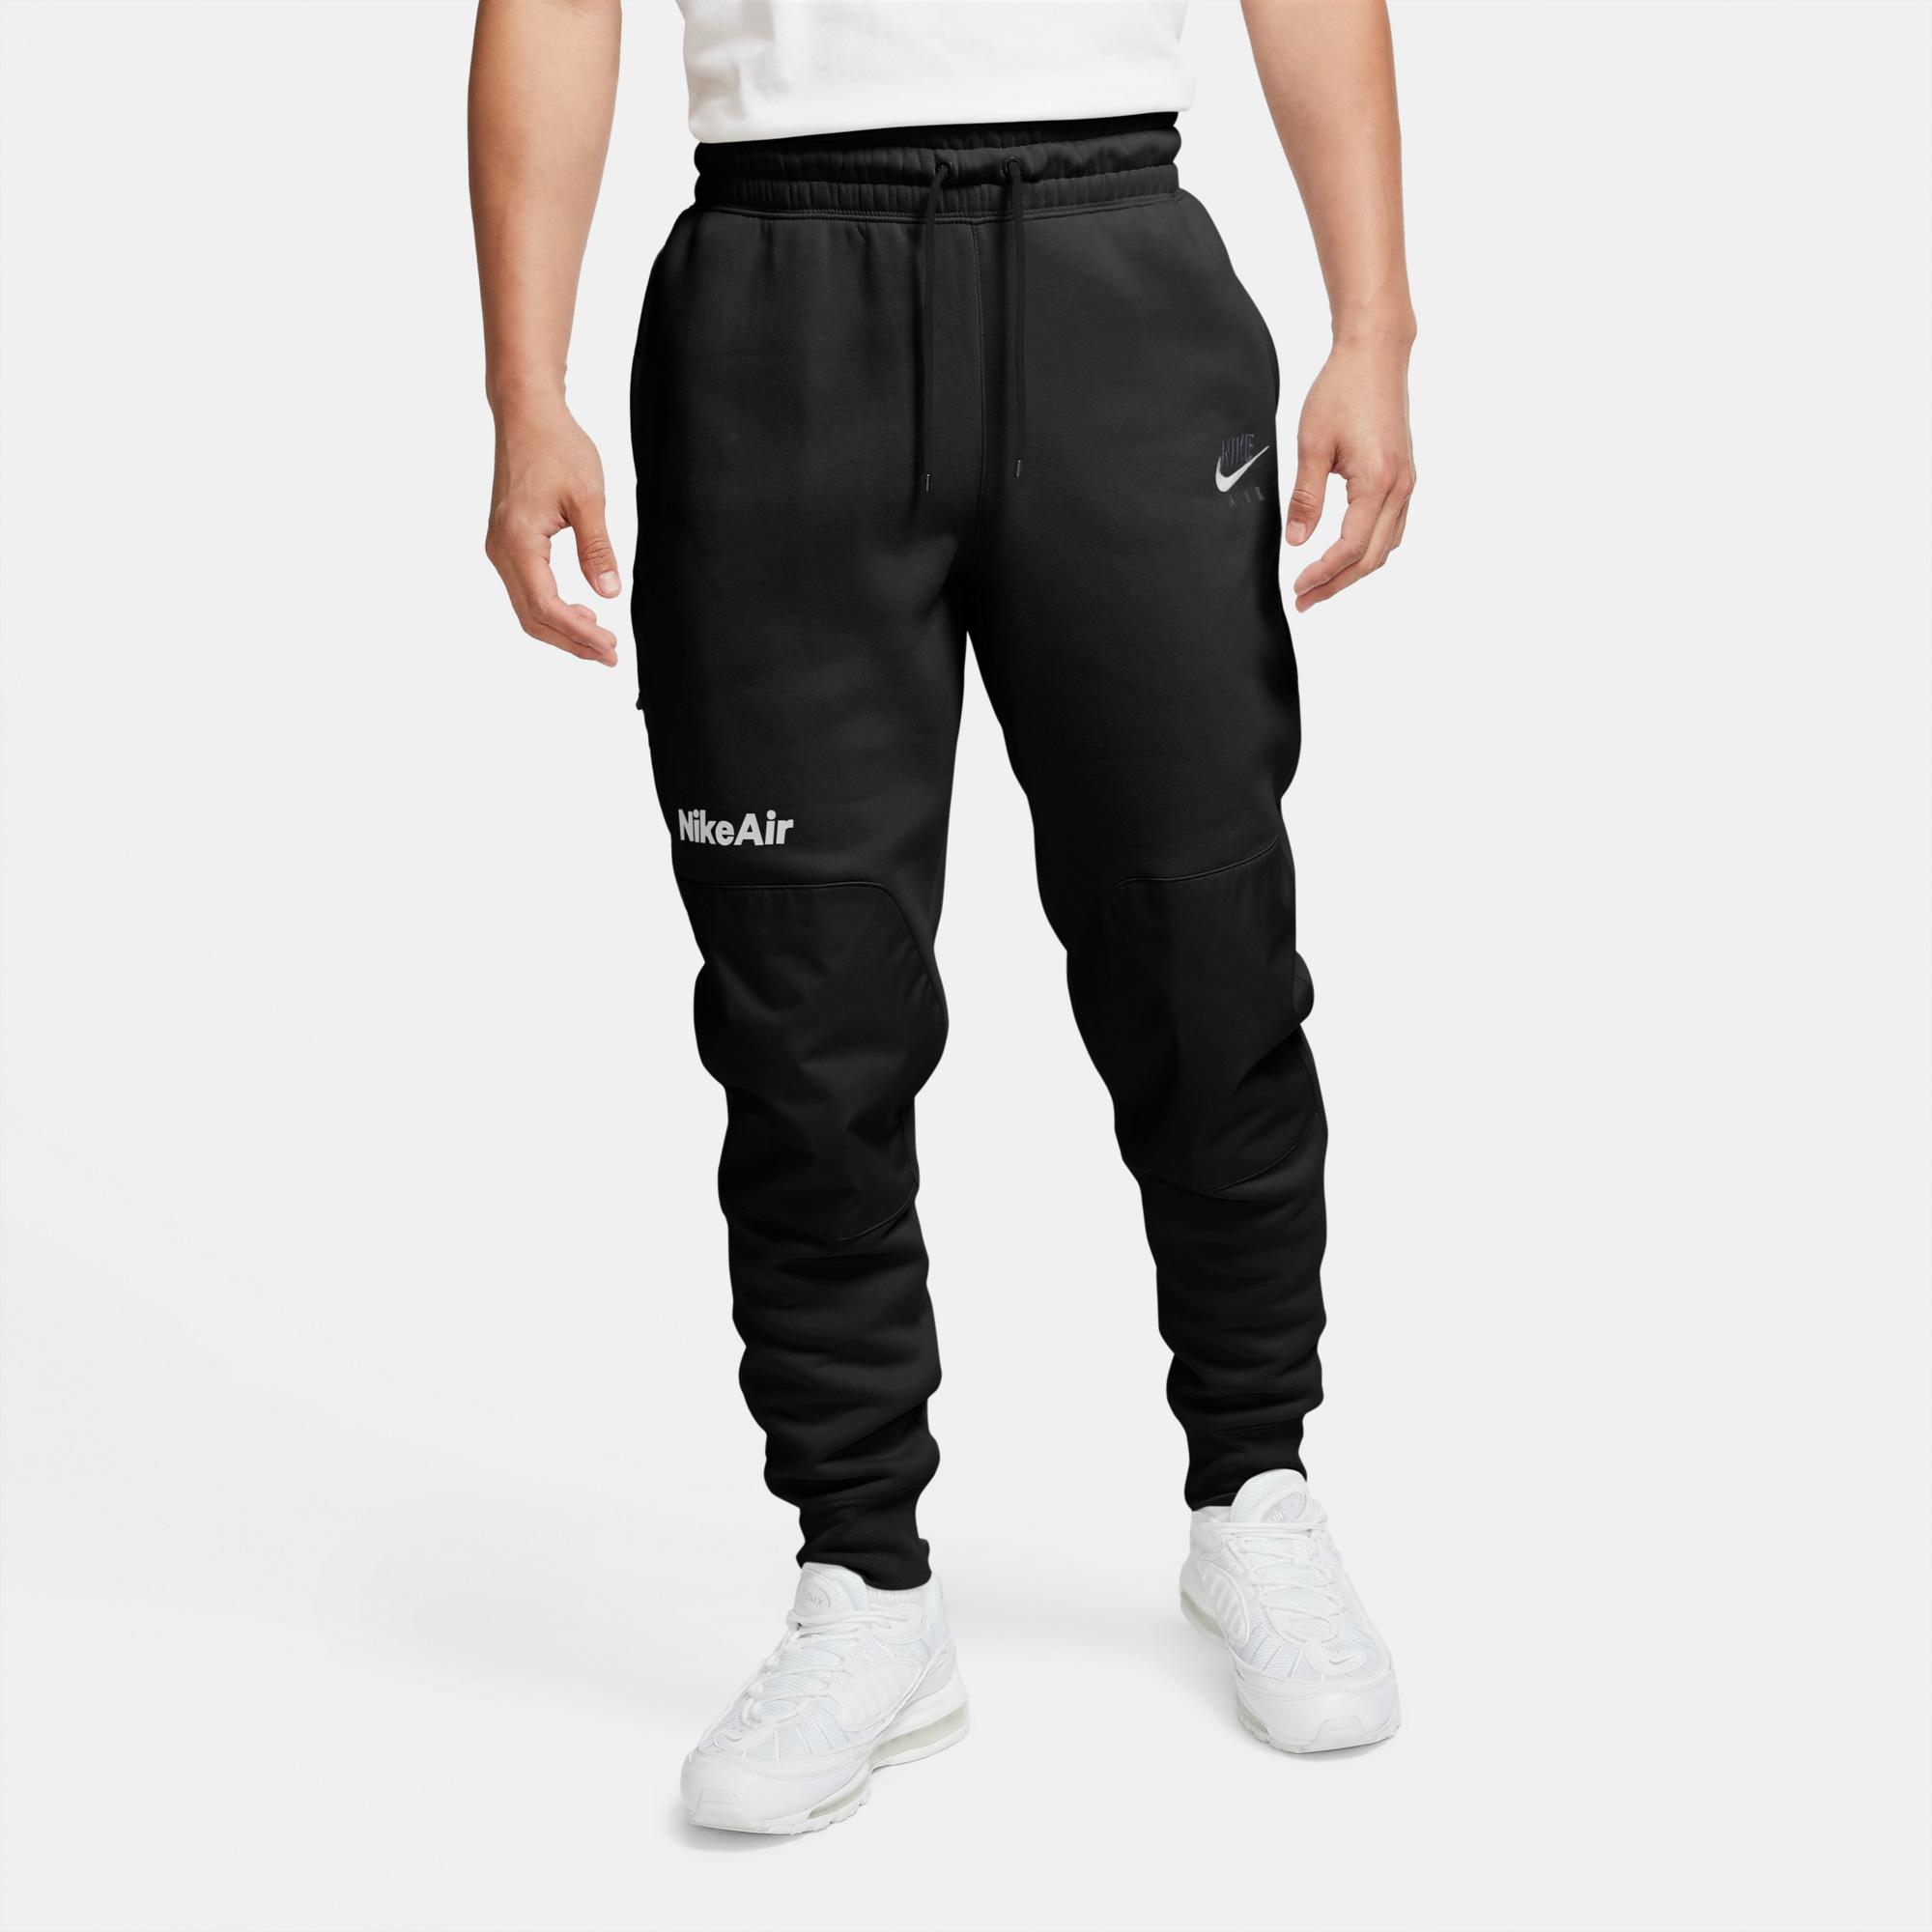 Nike Air Erkek Siyah Eşofman Altı